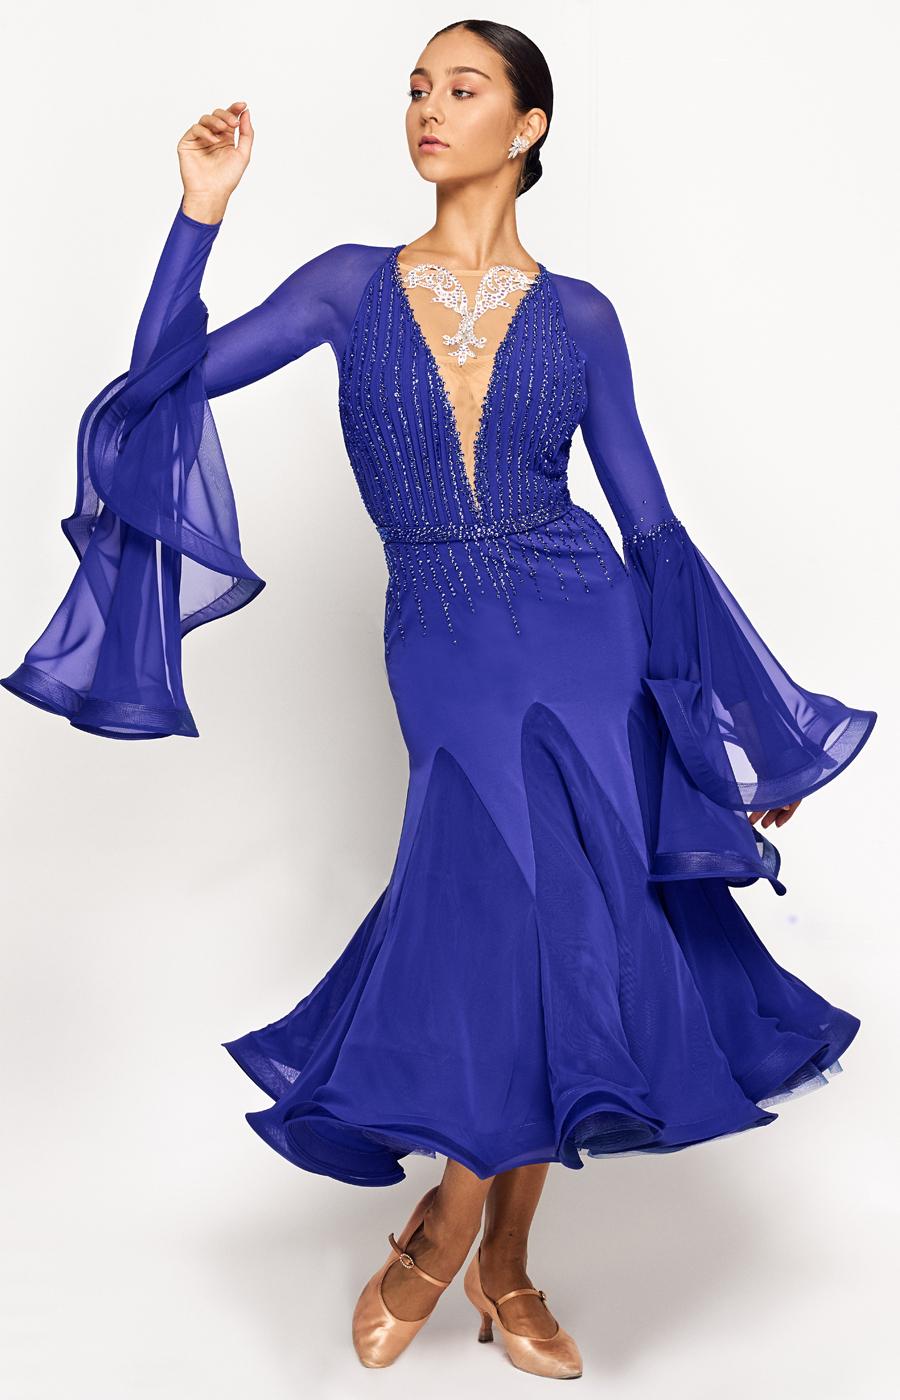 Ballroom dress Dauphine